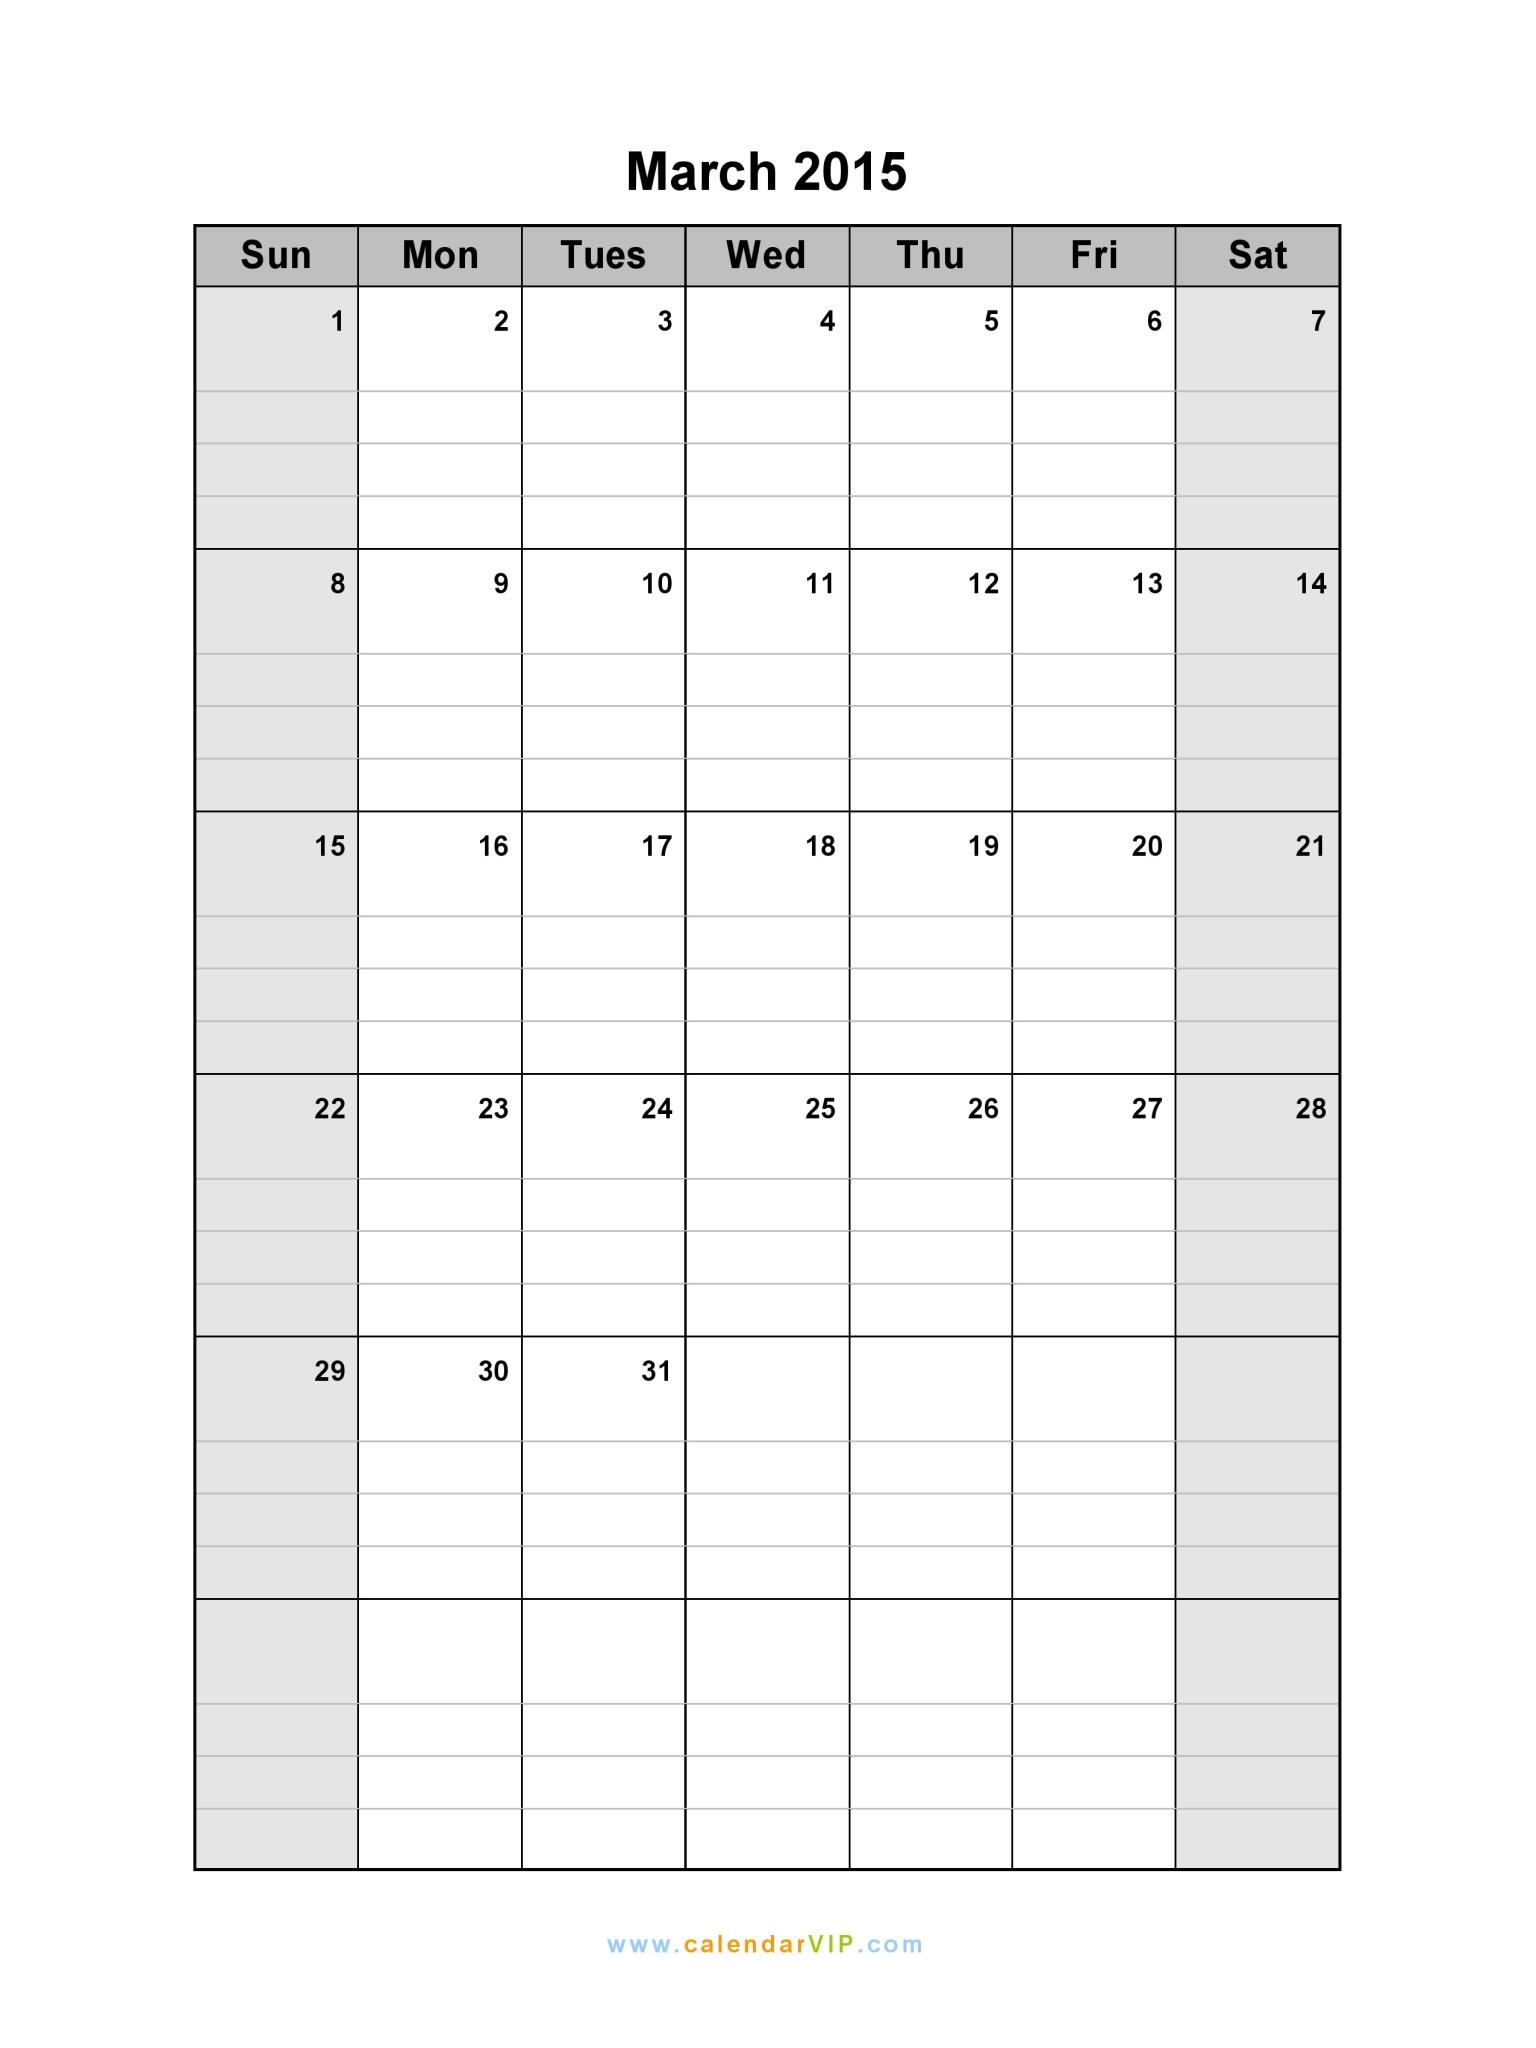 March 2015 Calendar - Blank Printable Calendar Template in PDF Word ...